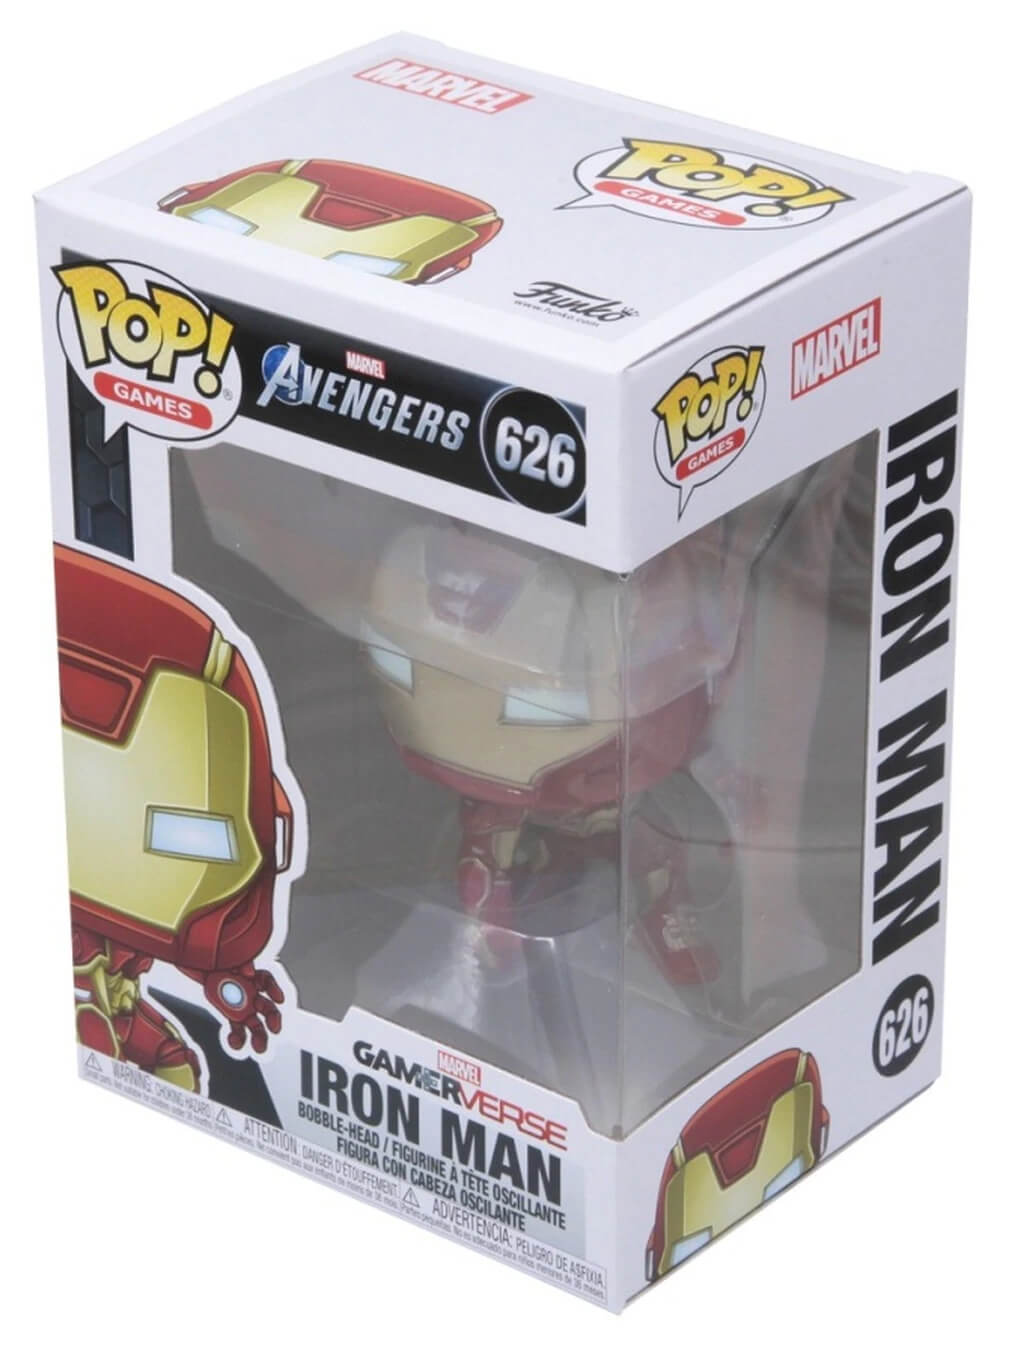 Iron Man (Homem de Ferro) Avengers (Vingadores) Gamerverse #626 - Funko Pop! Games